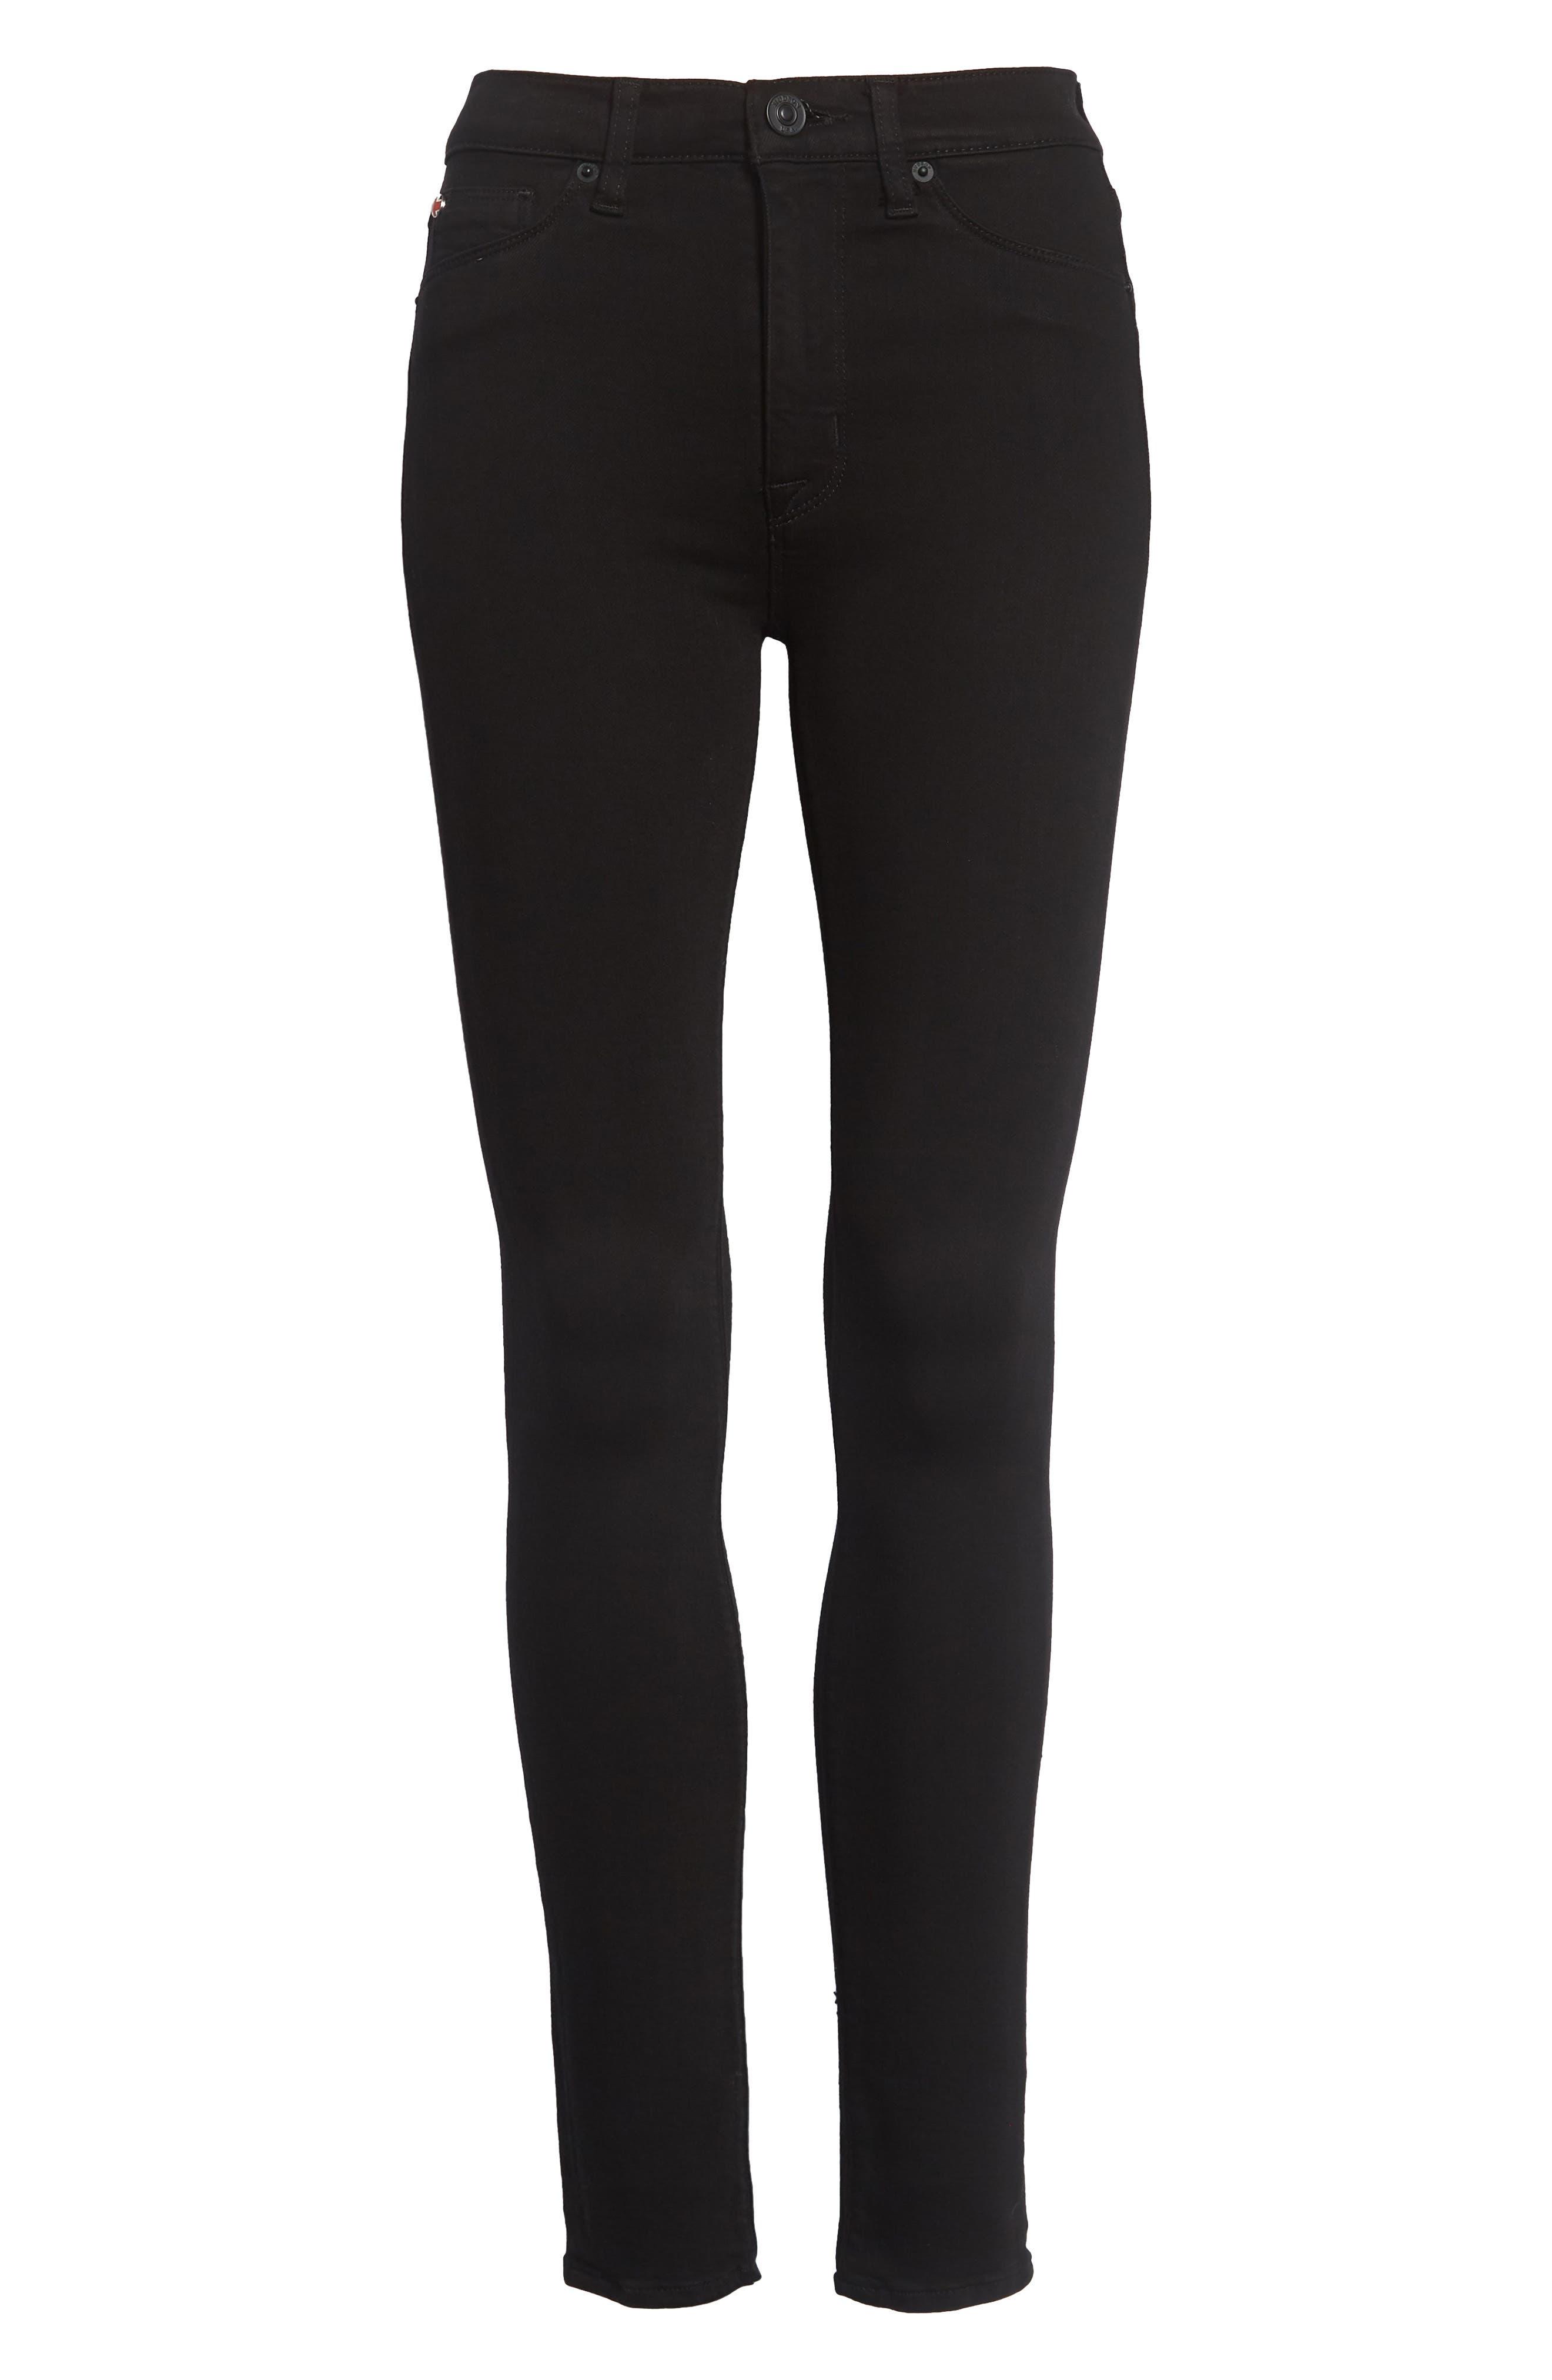 Barbara High Waist Skinny Jeans,                             Alternate thumbnail 2, color,                             001